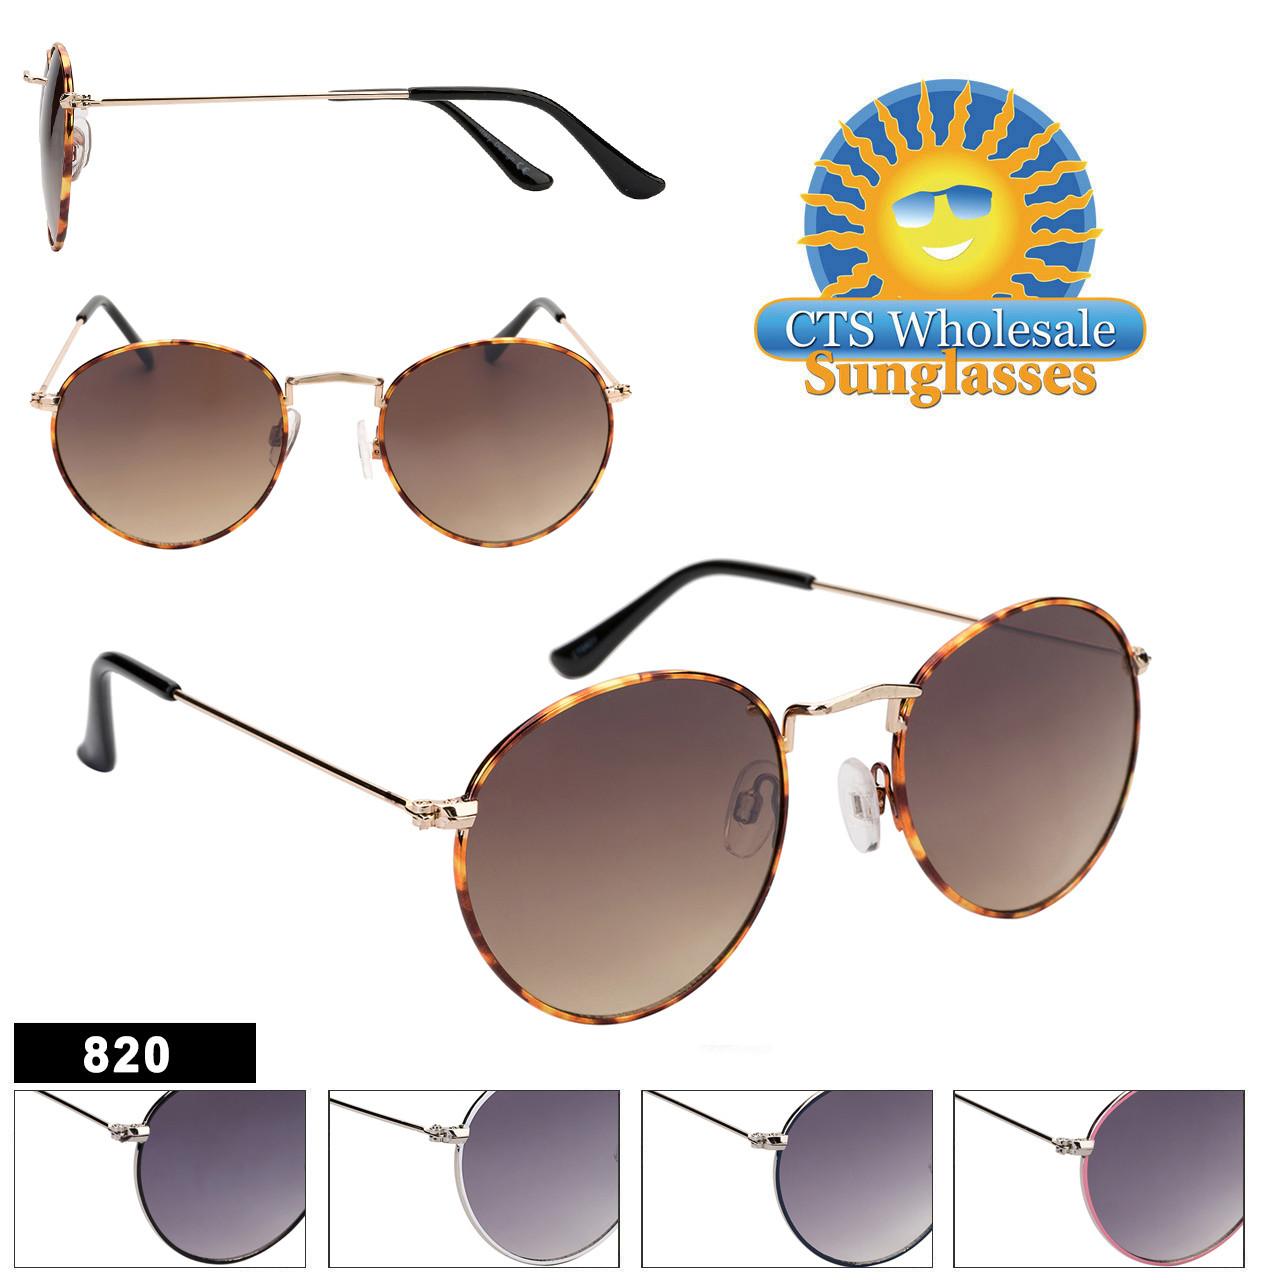 Metal Sunglasses 820